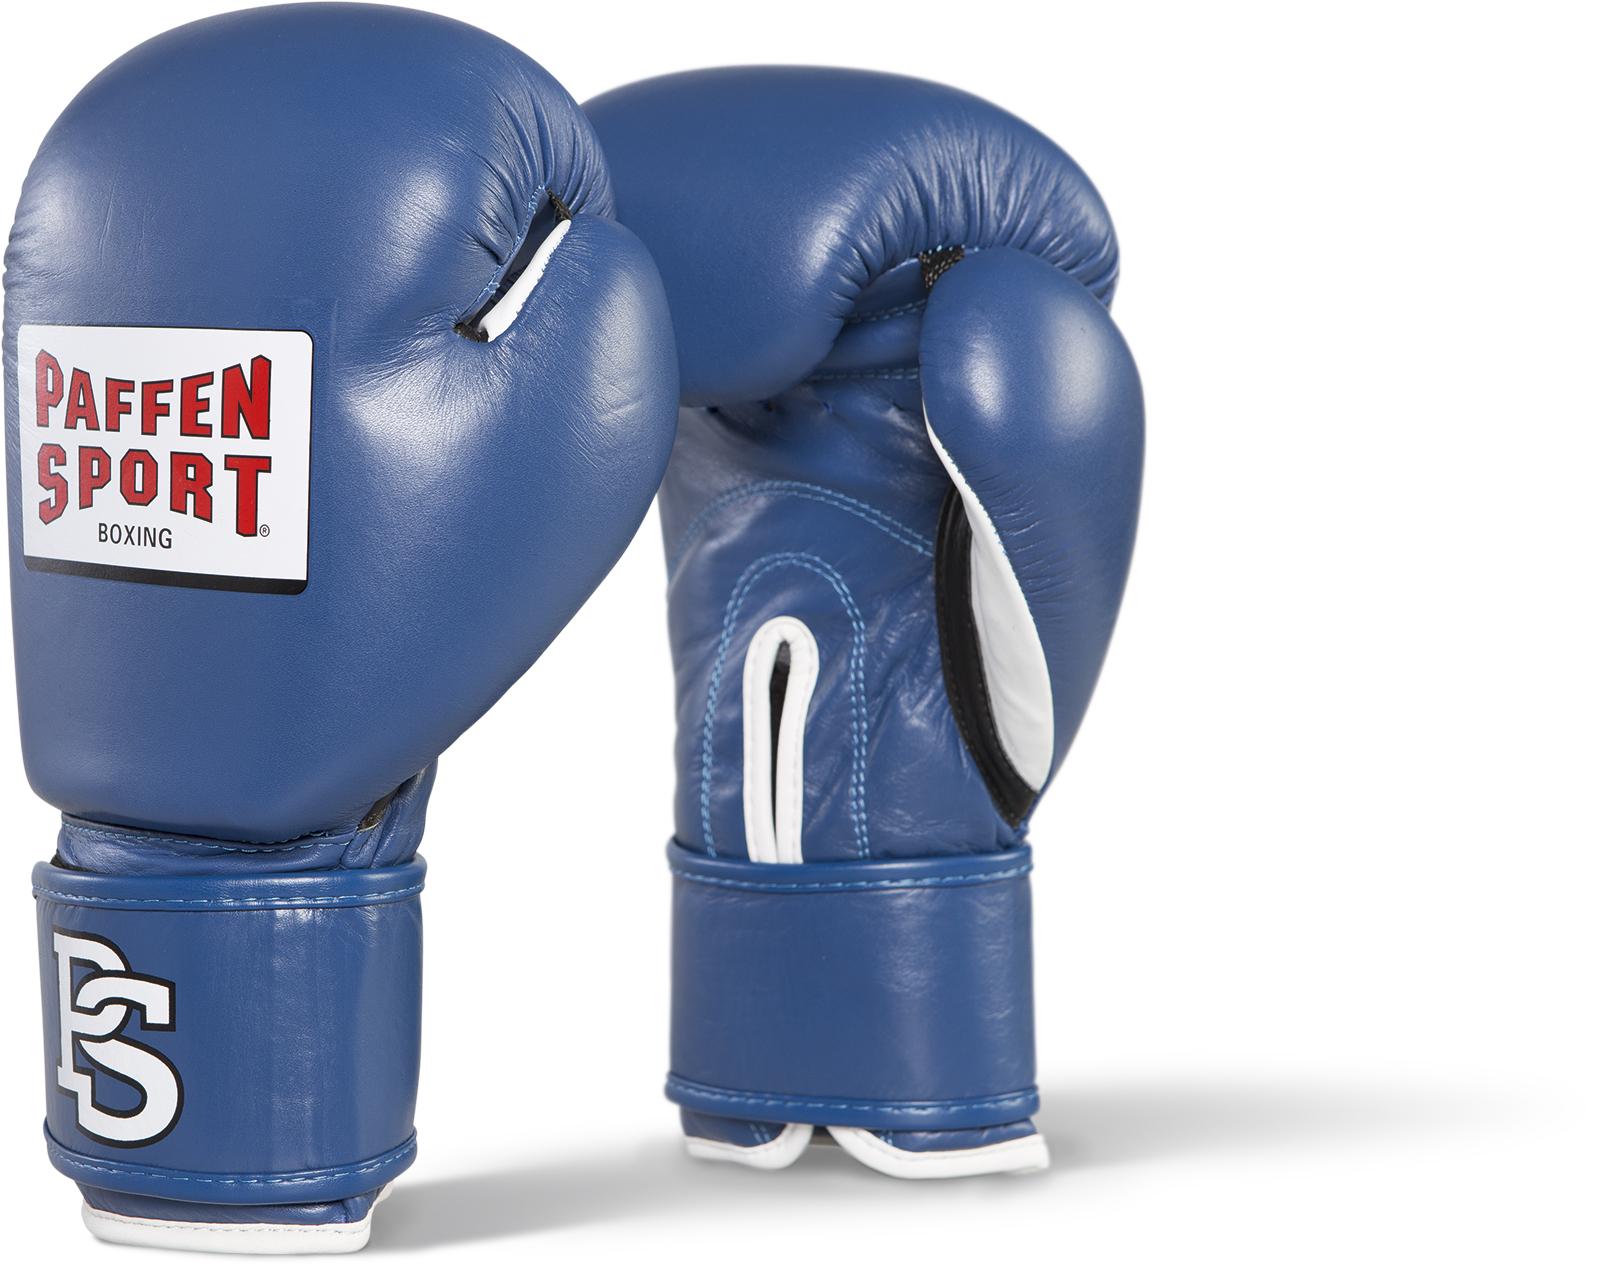 Paffen Sport Contest Bokshandschoenen - Met DBV Seal of Approval - - Blauw - 10 oz